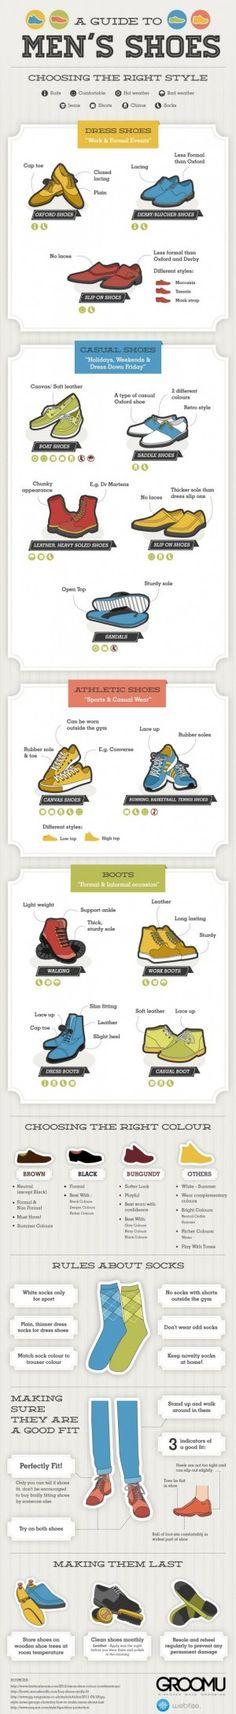 mens-shoe-guide